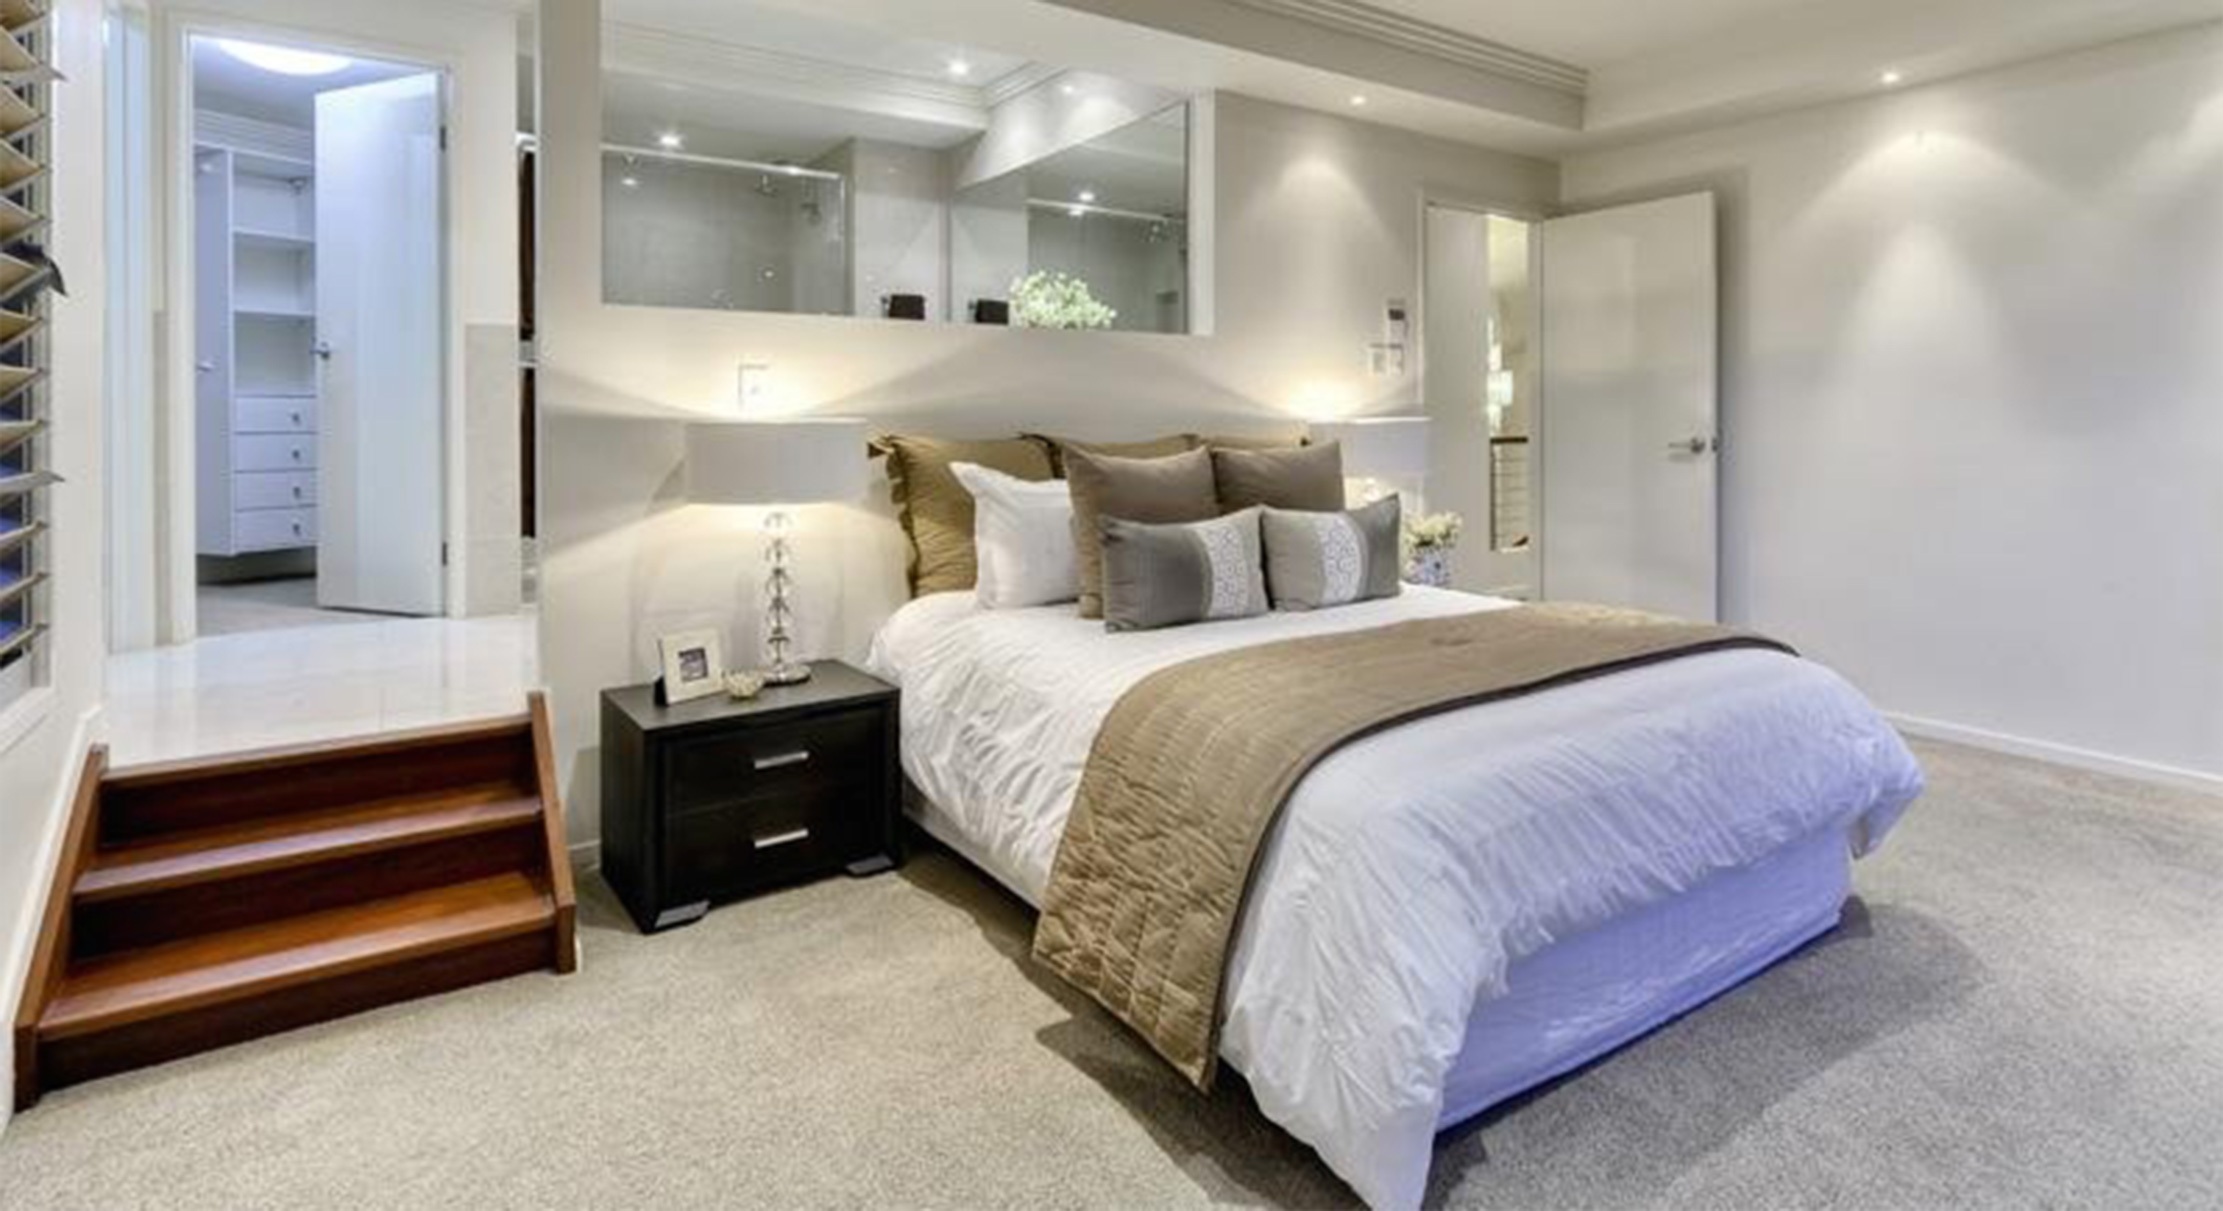 portfolio-2-slider-image-3-bedroom-newmarket-gary-cramb-constructions-brisbane